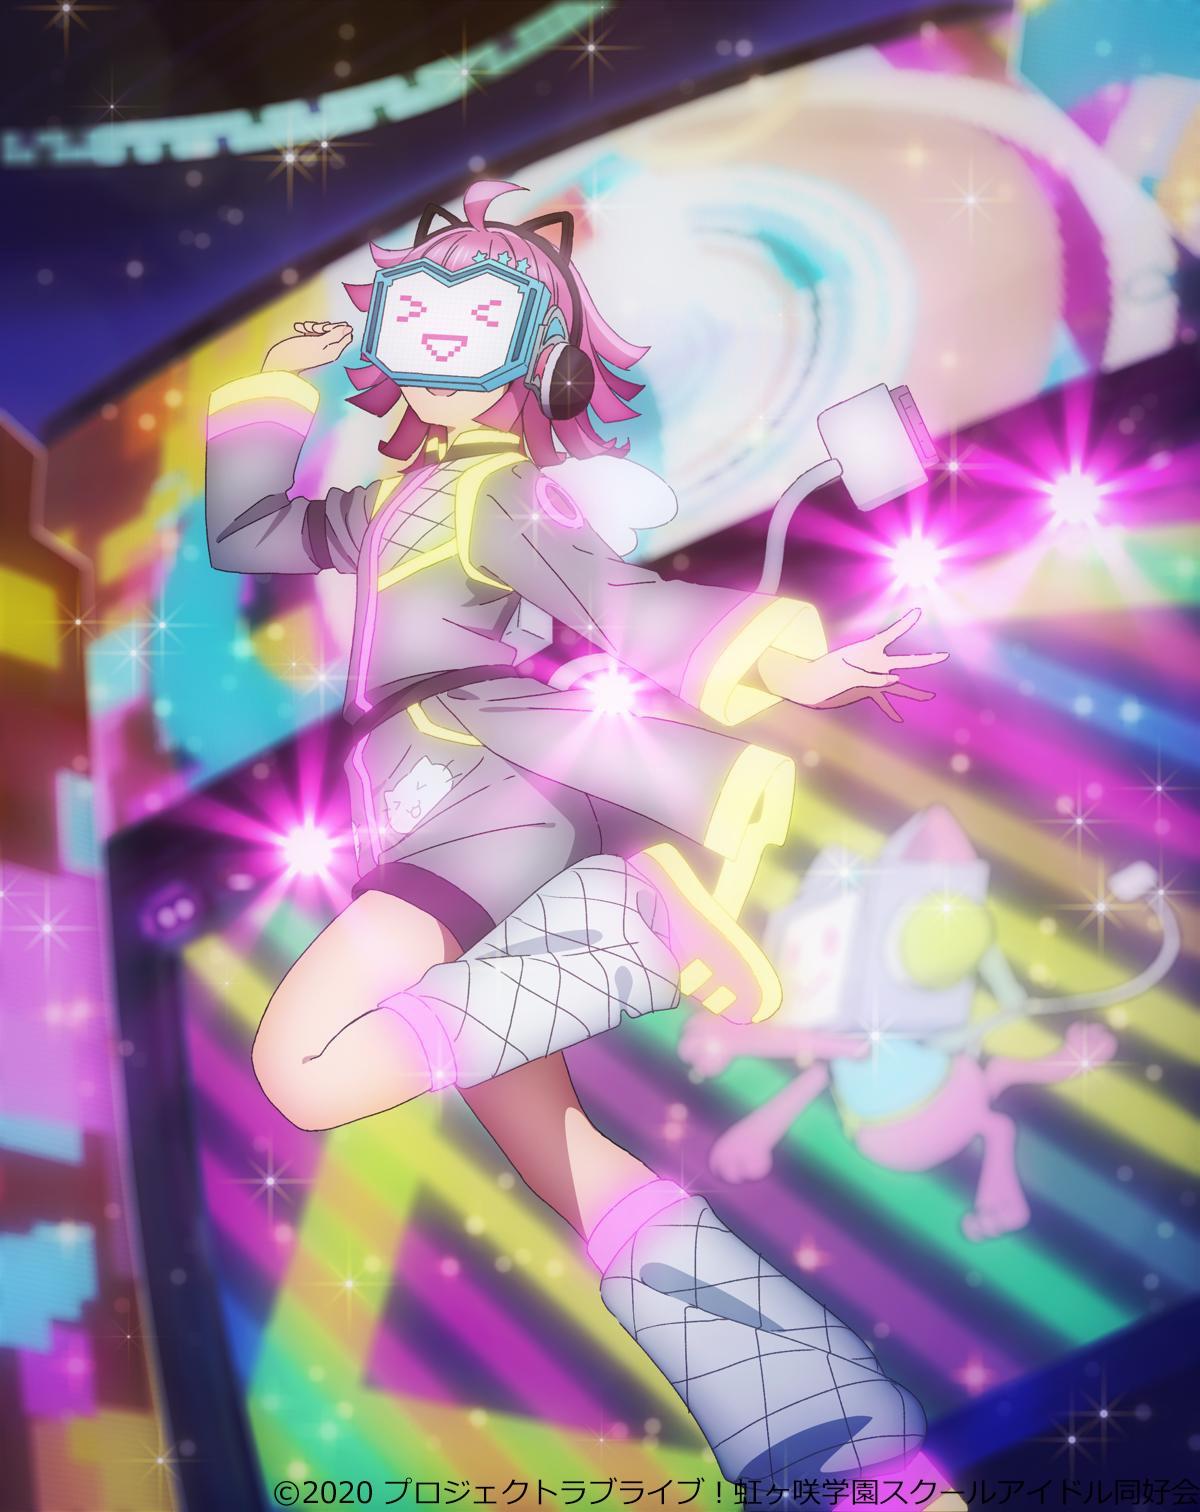 TVアニメ「ラブライブ!虹ヶ咲学園スクールアイドル同好会」Blu-ray 第4巻